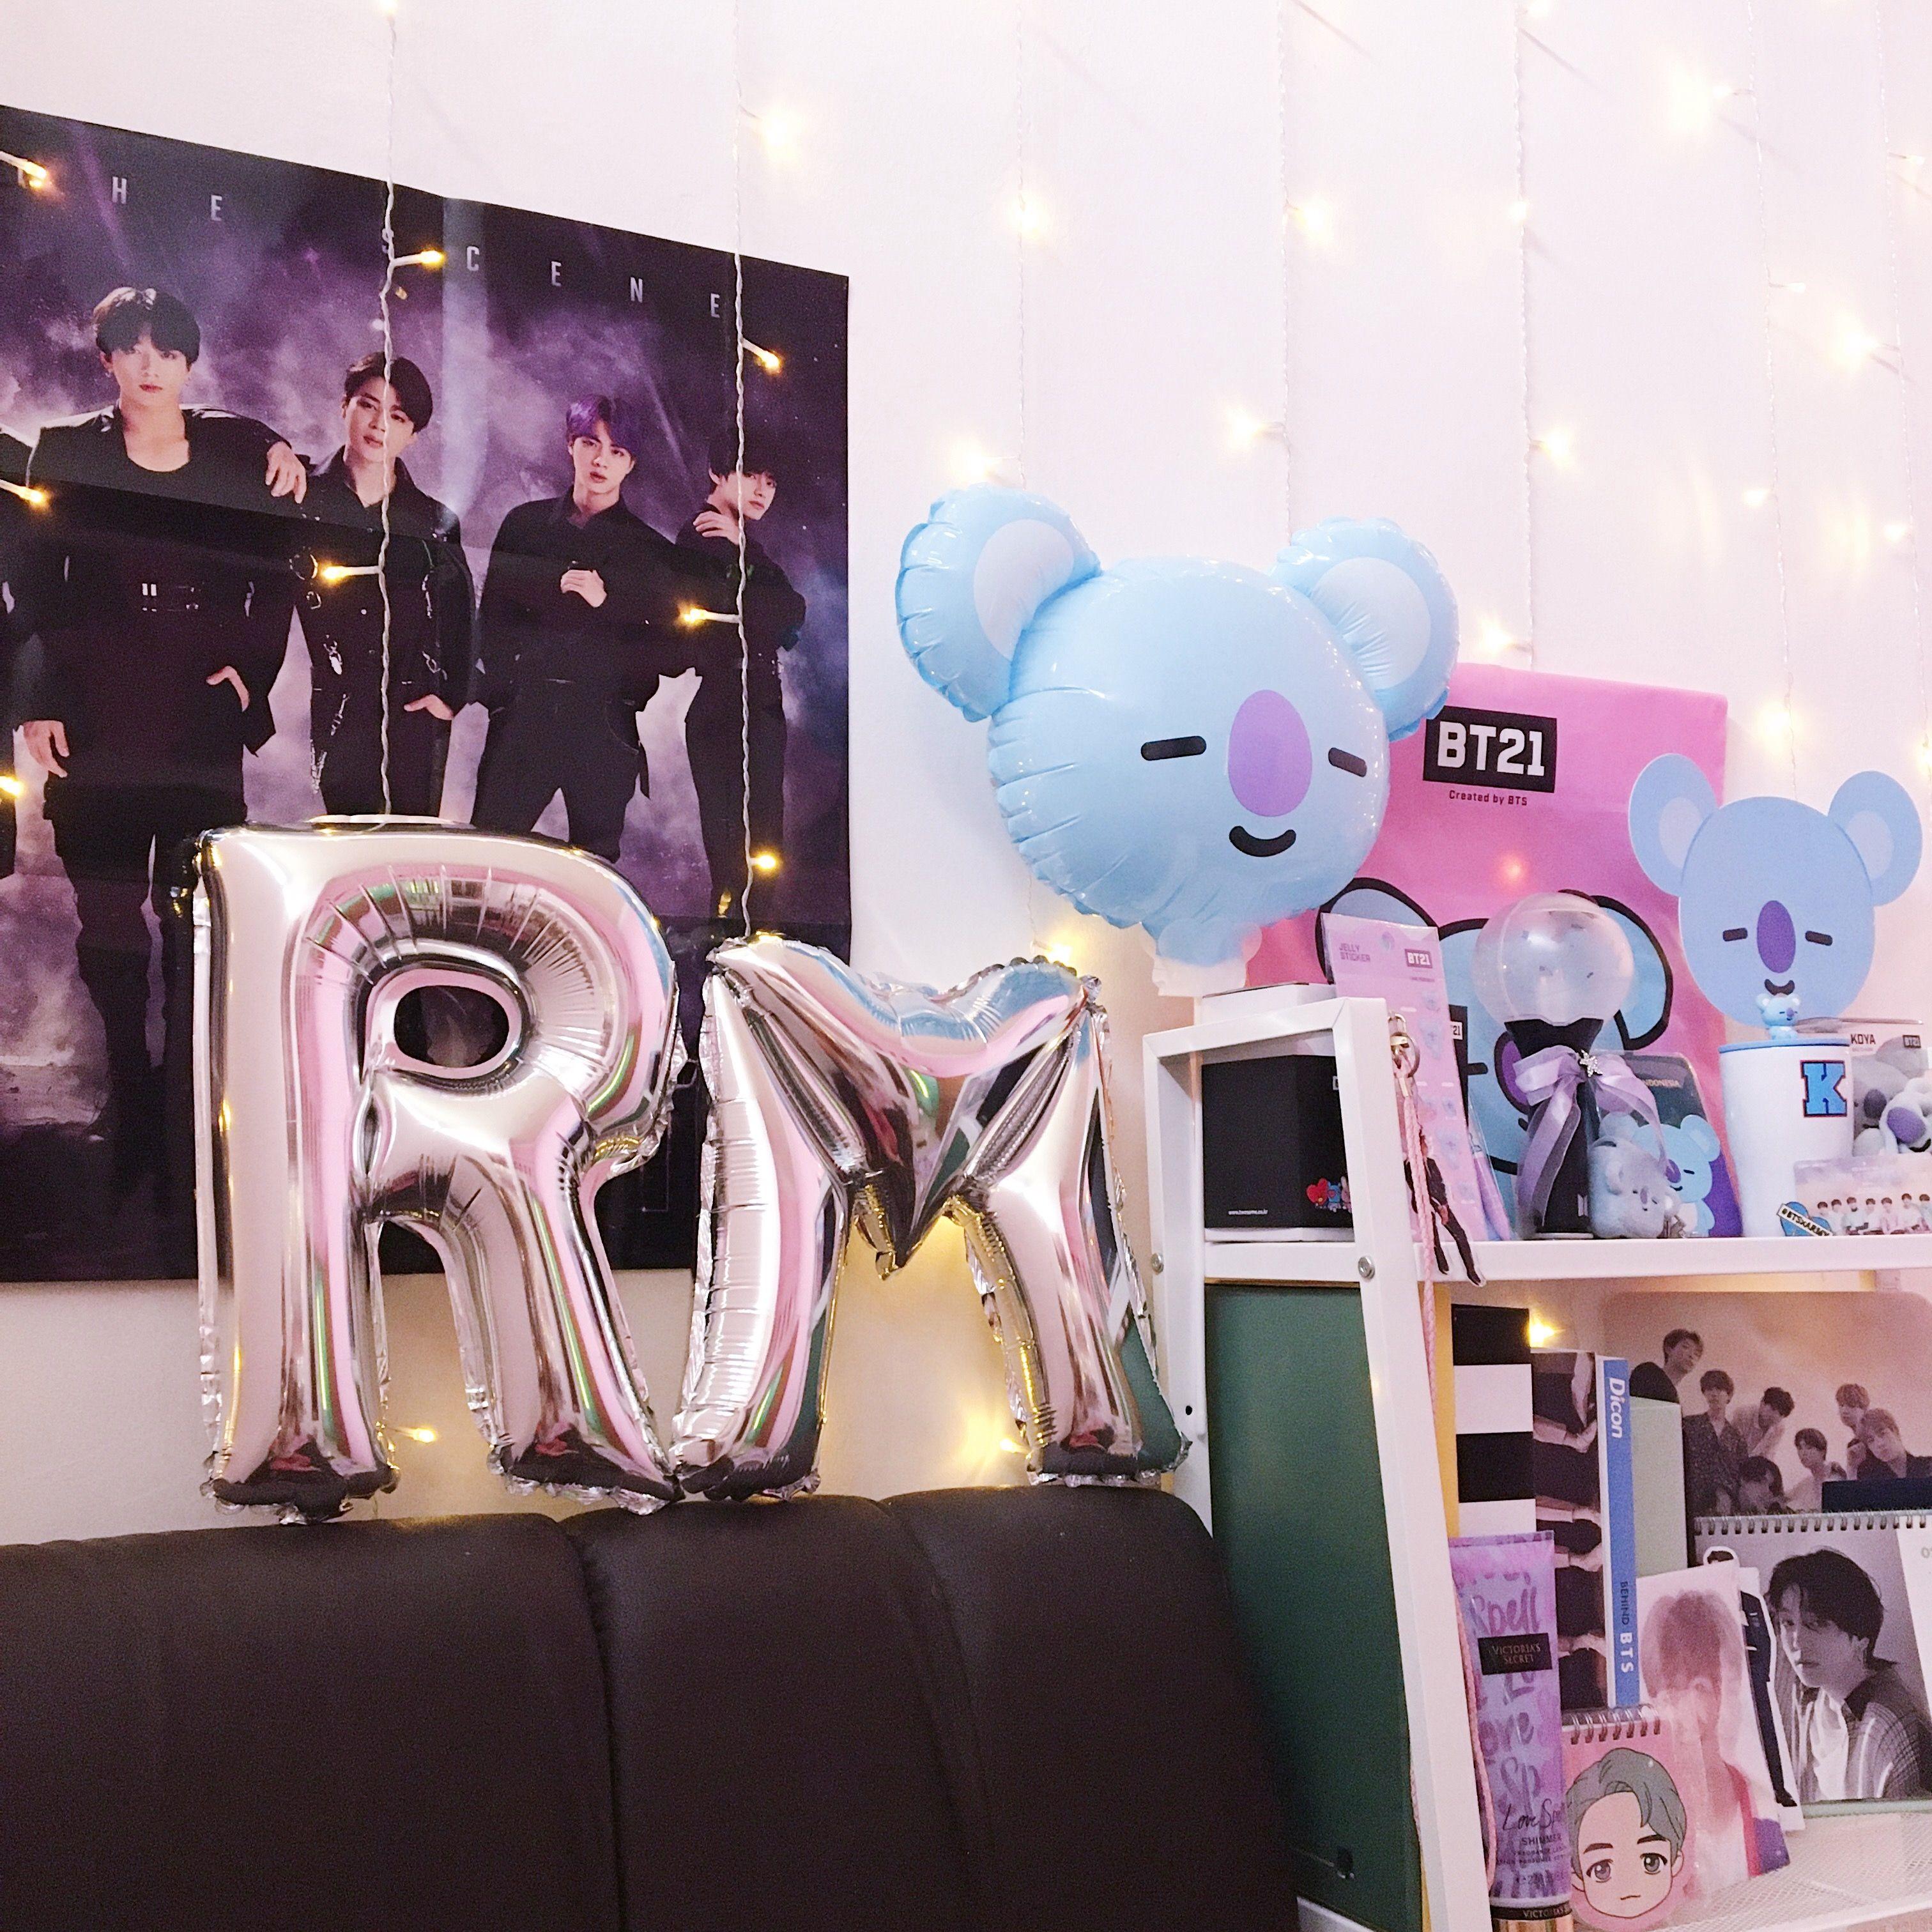 Bts Room Decor Room Decor Indie Room Decor Luxury BTS room pictures